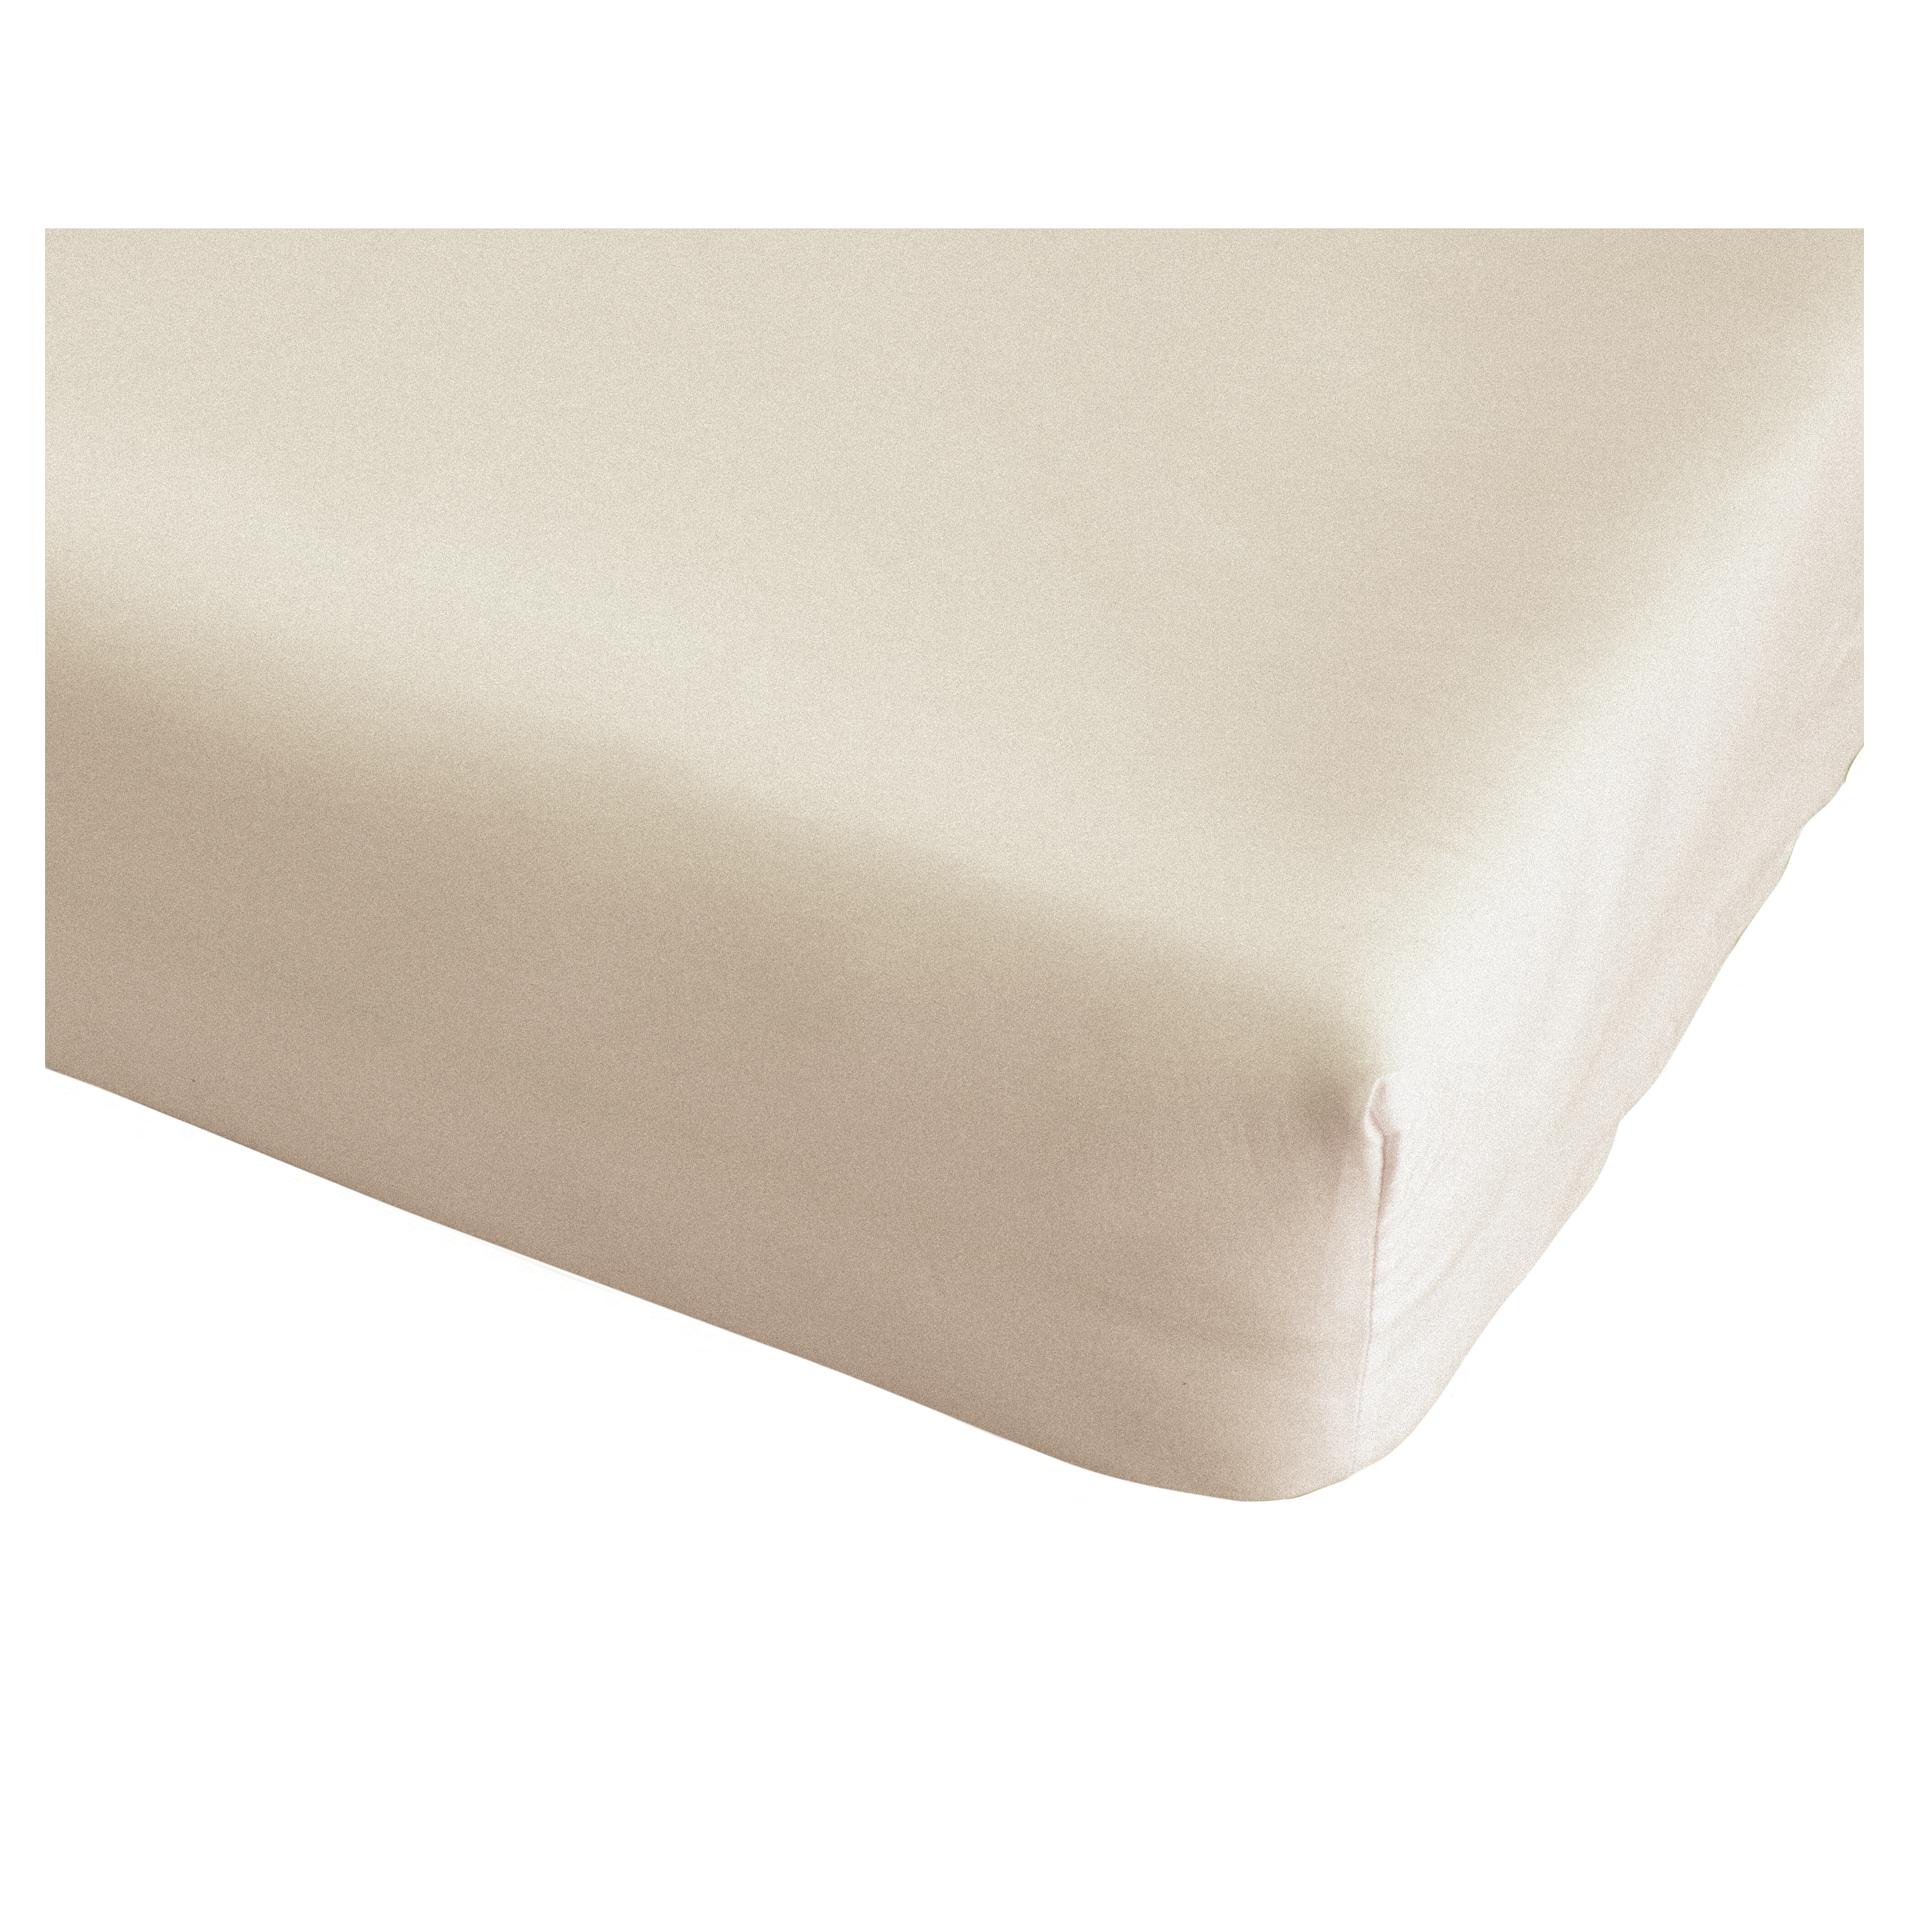 Microfleece-Spannbettlaken (90-100x200, beige)